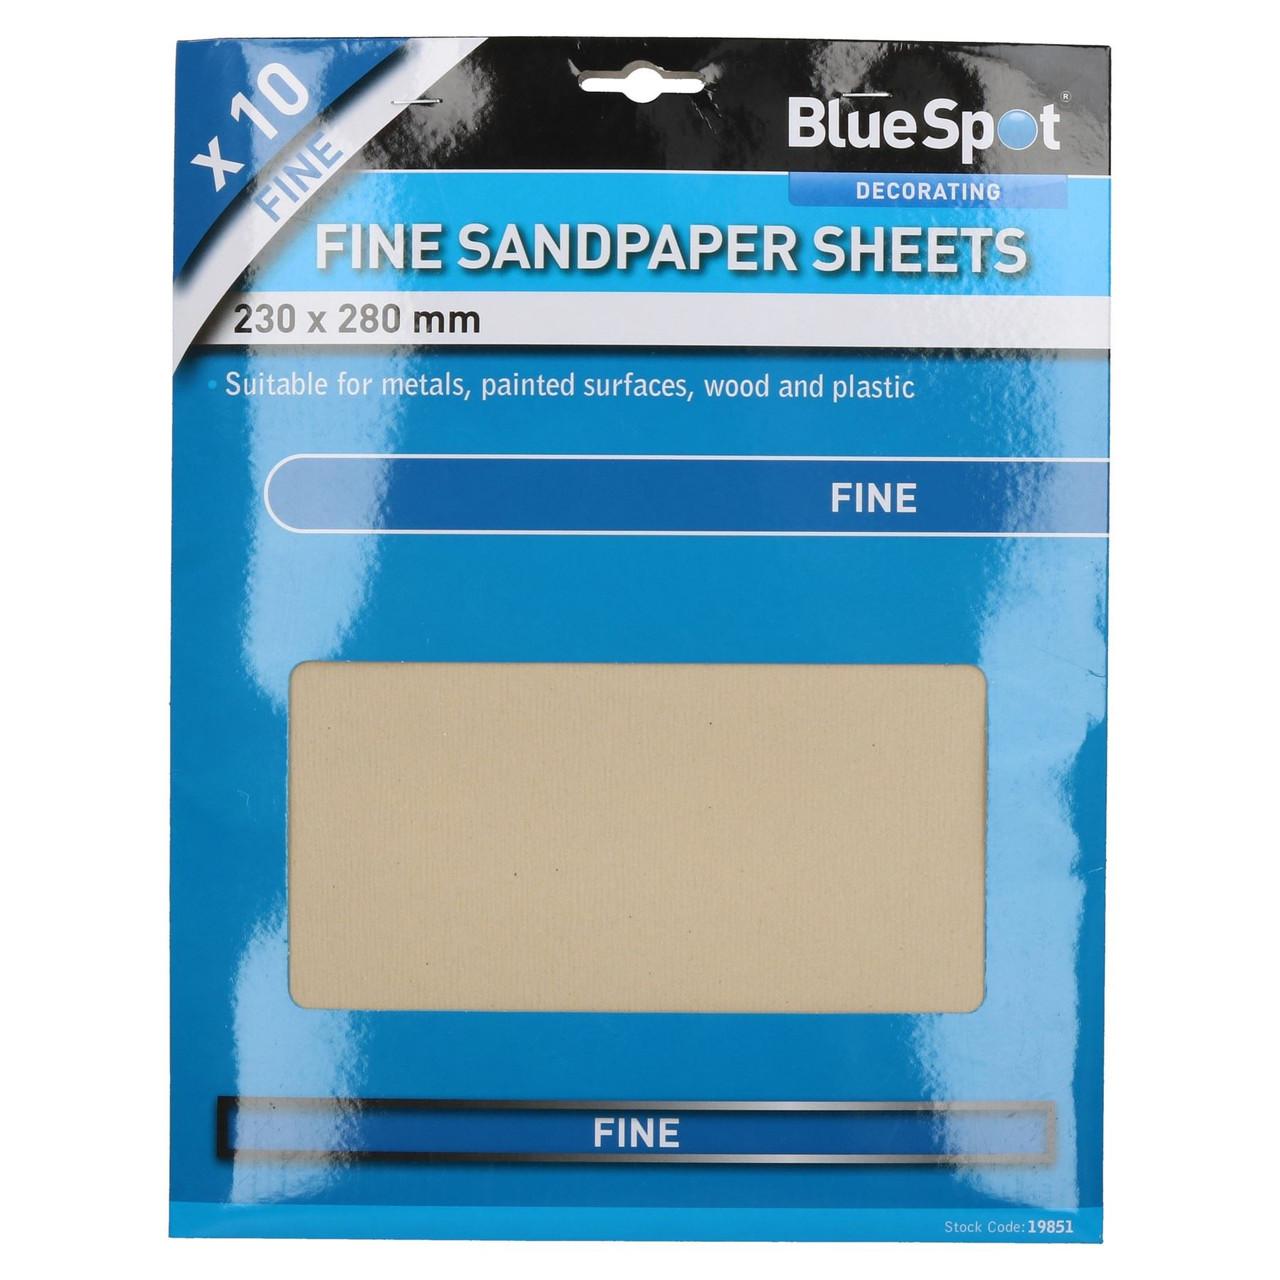 10pc Assorted Sandpaper Sanding Sheets for Metal Wood Plastic Fine 240 Grit